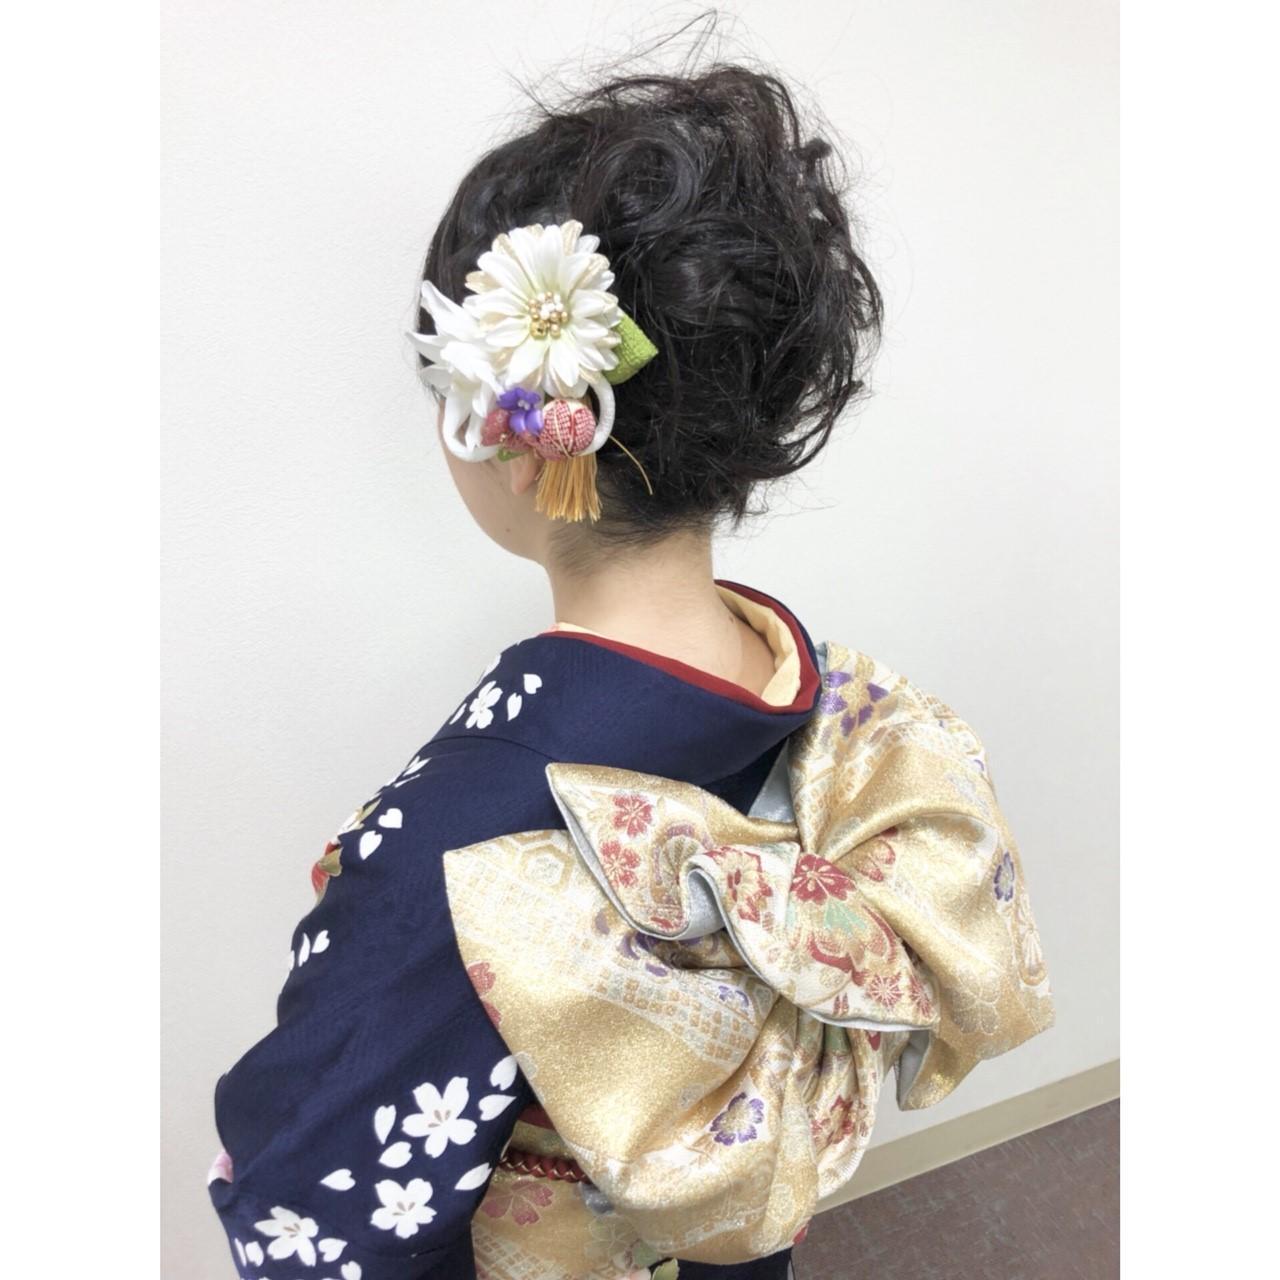 2018 土浦店 前撮り撮影会 春